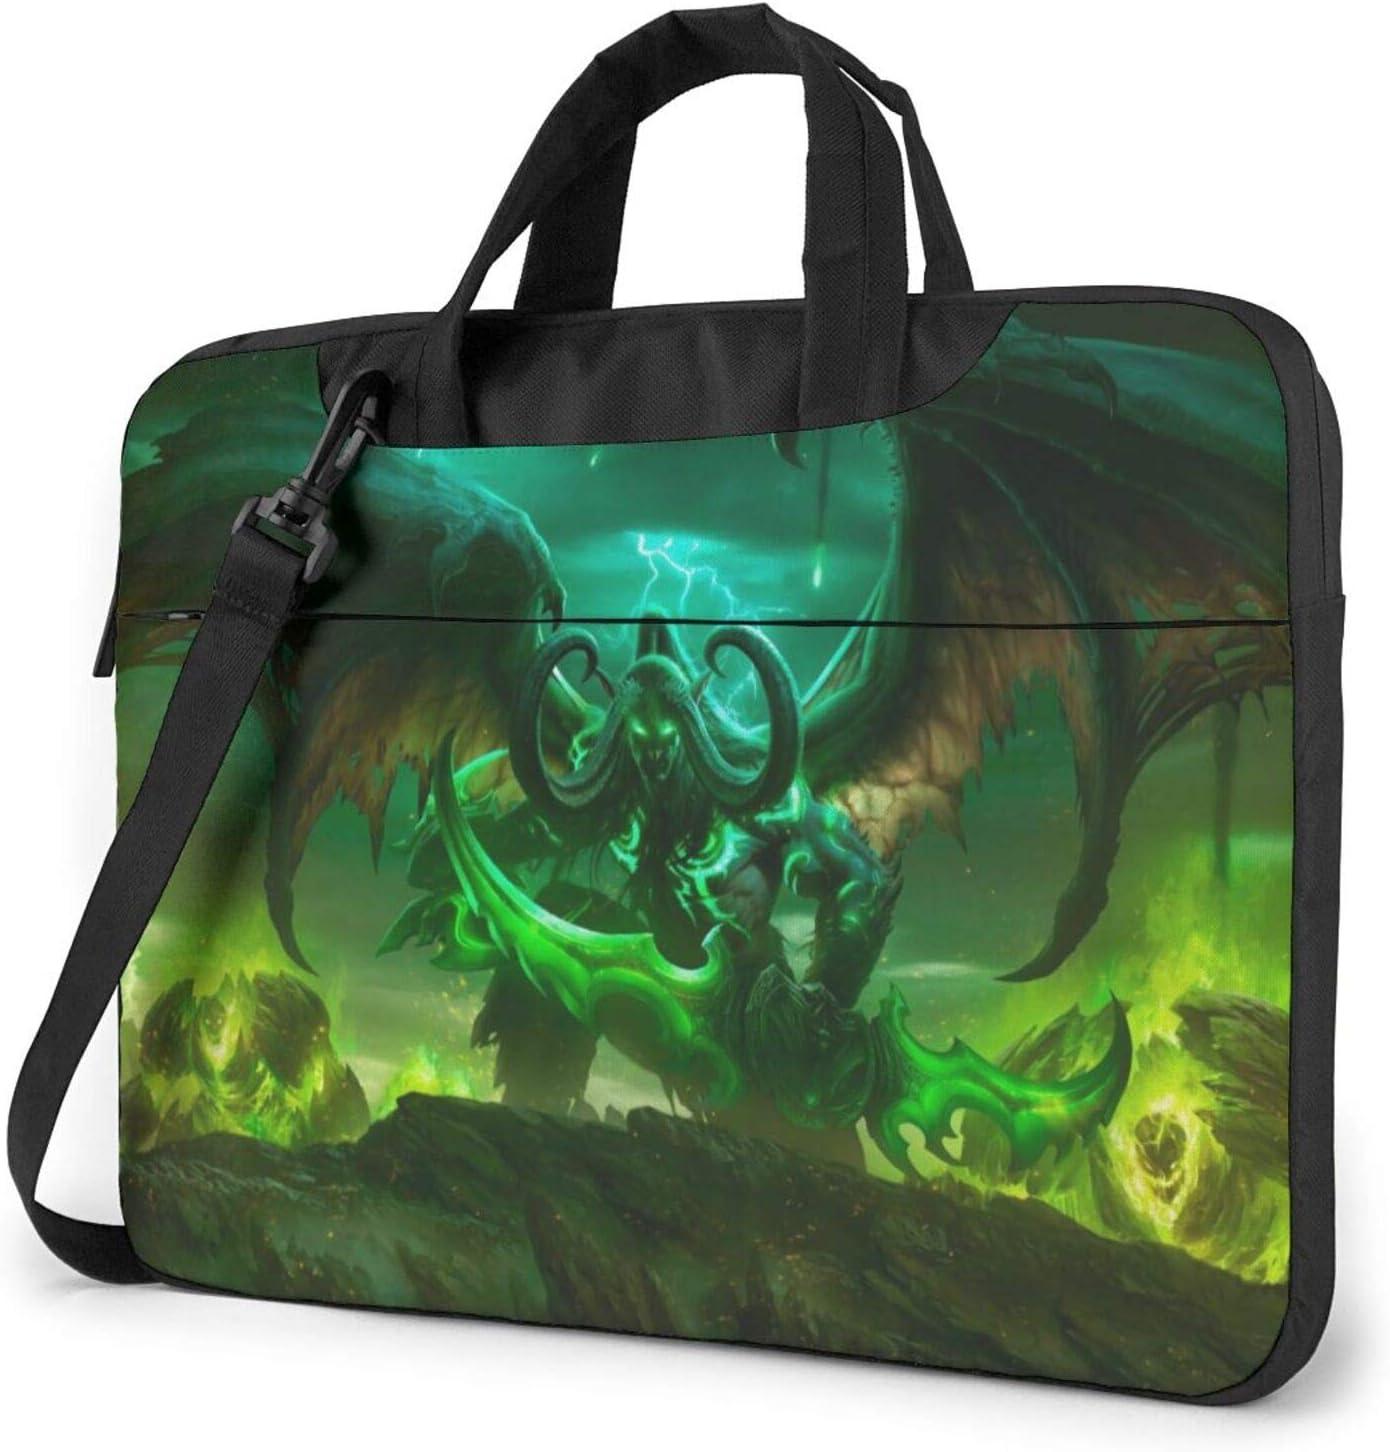 Laptop Sleeve Bag Regular store Case 15.6 B Portable Surprise price inch Notebook